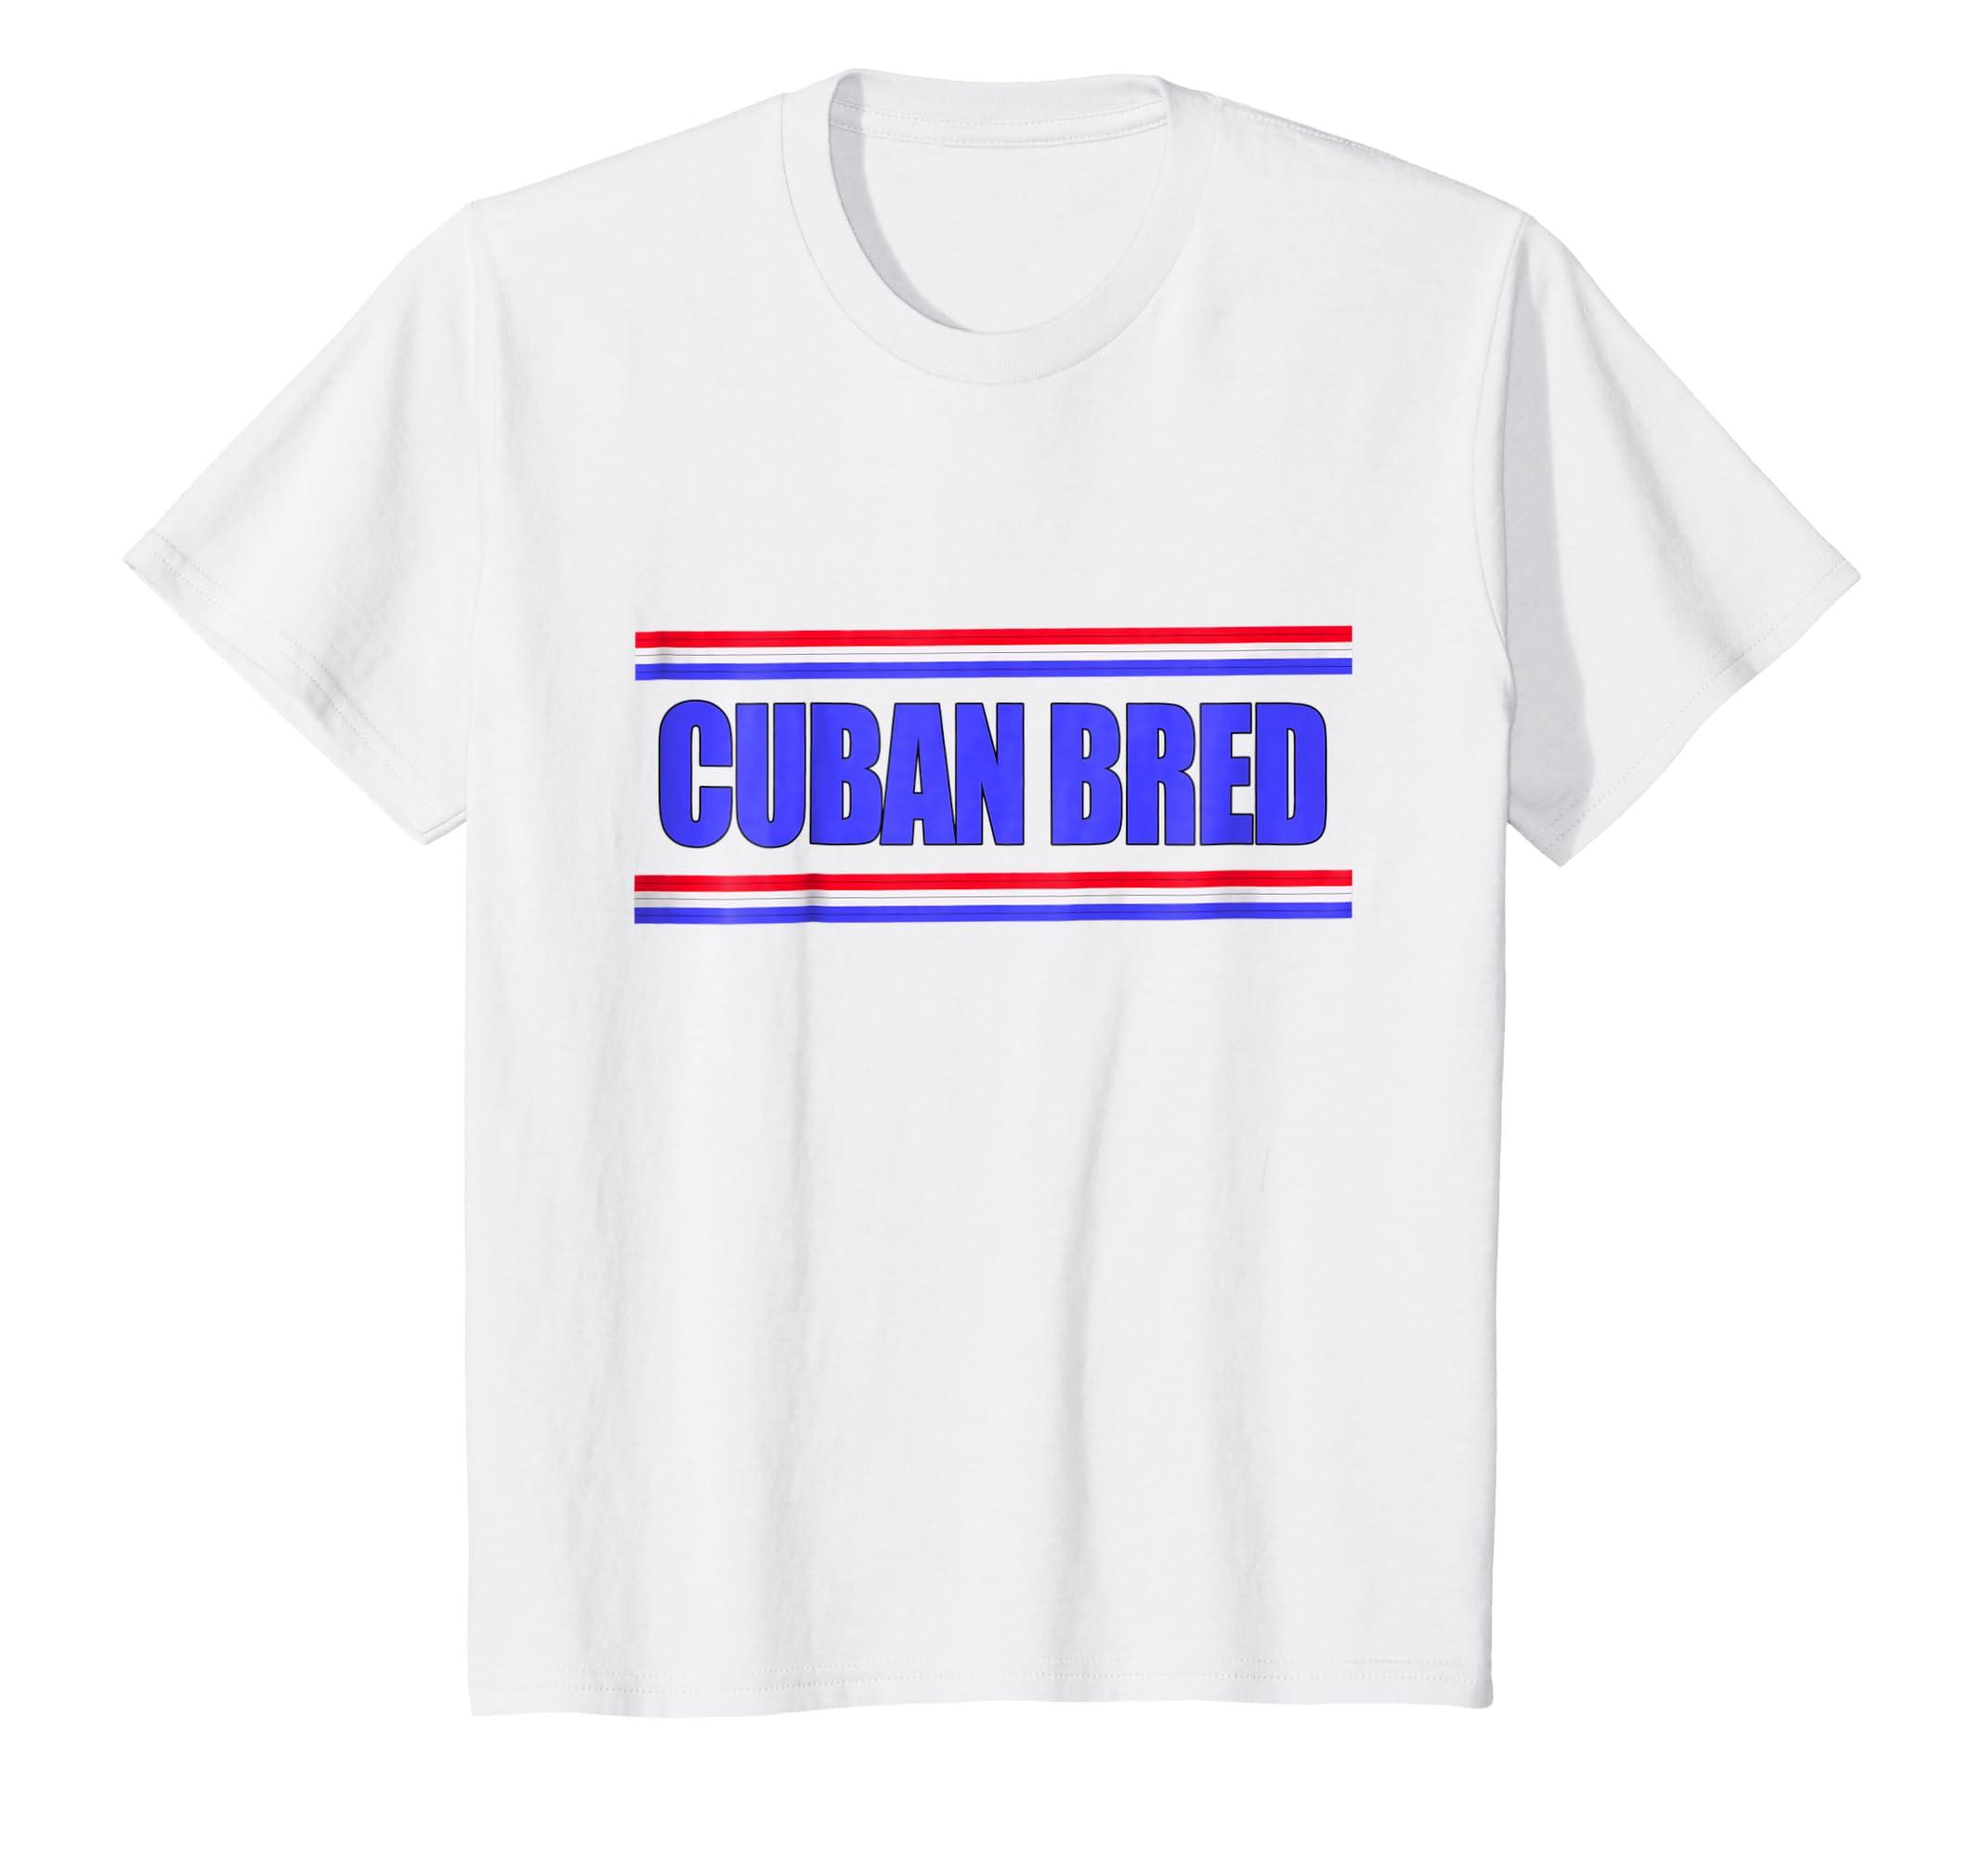 Funny Cuban Bred T Shirt For Miami Cuba Natives